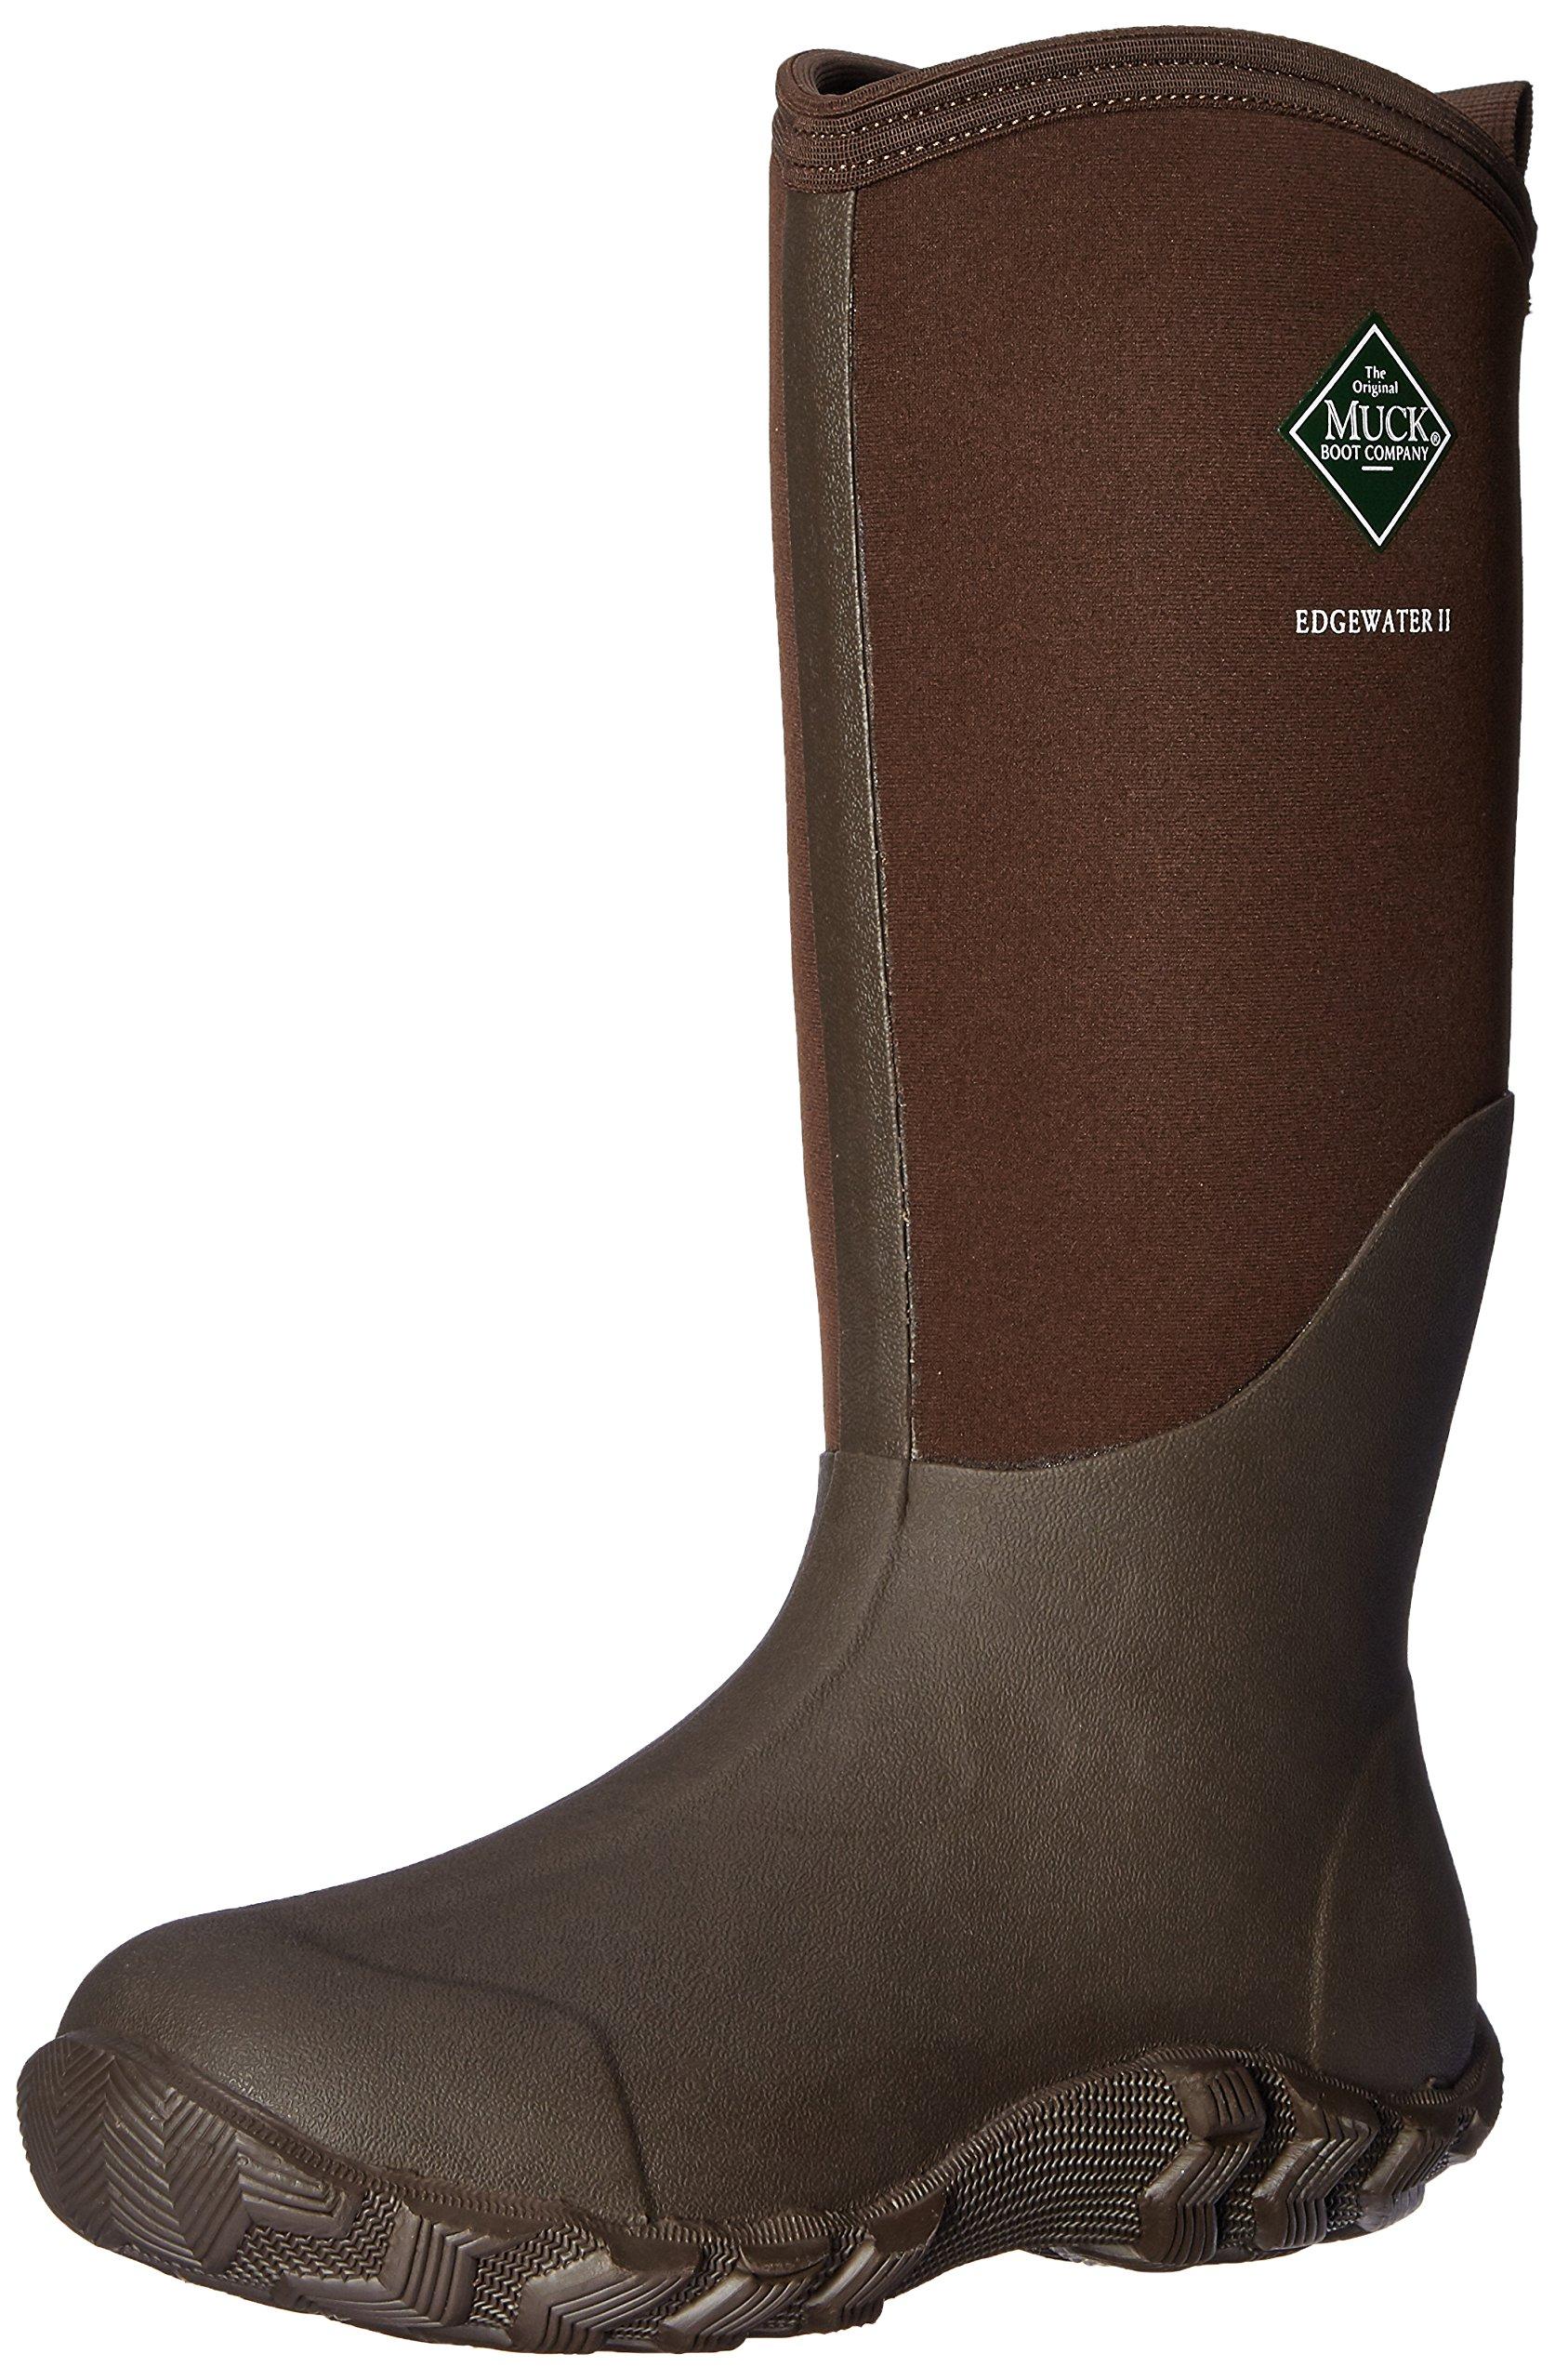 Muck Boot Men's Edgewater II Tall Snow Boot, Chocolate Brown, 10 D(M) US